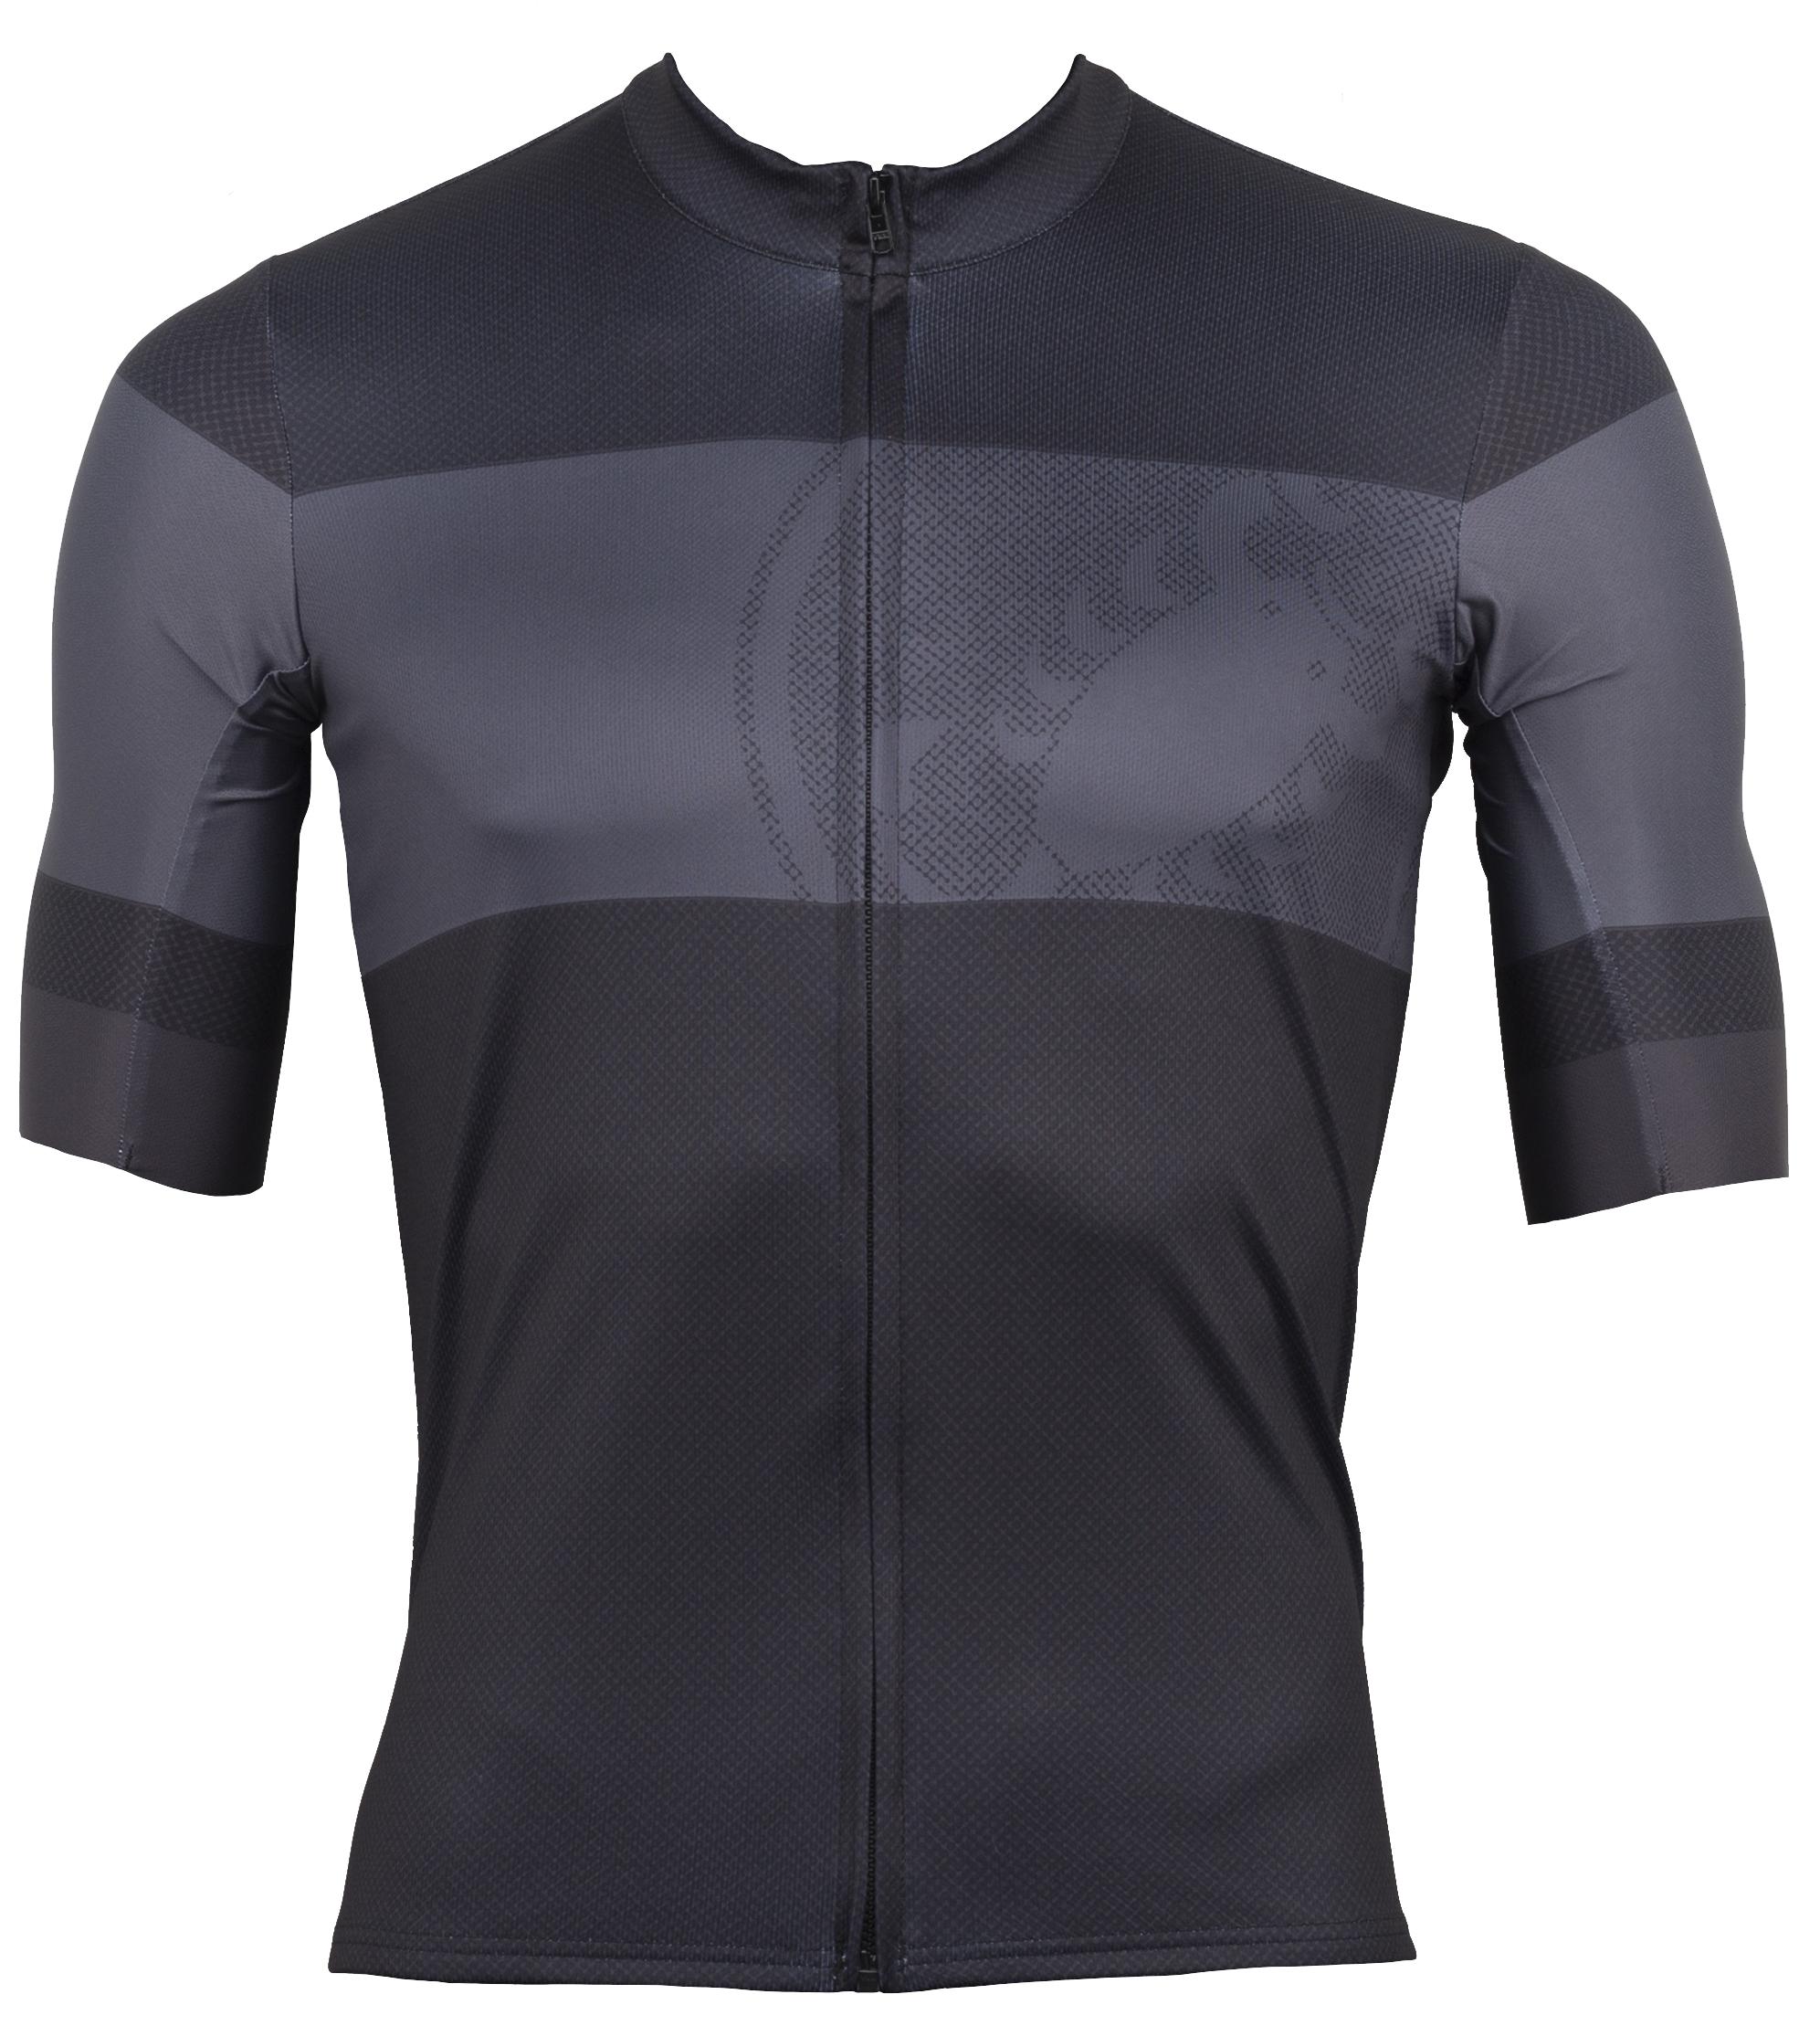 SAGE GREEN NEW 2019 Castelli RUOTA Short Sleeve Full Zip Cycling Jersey